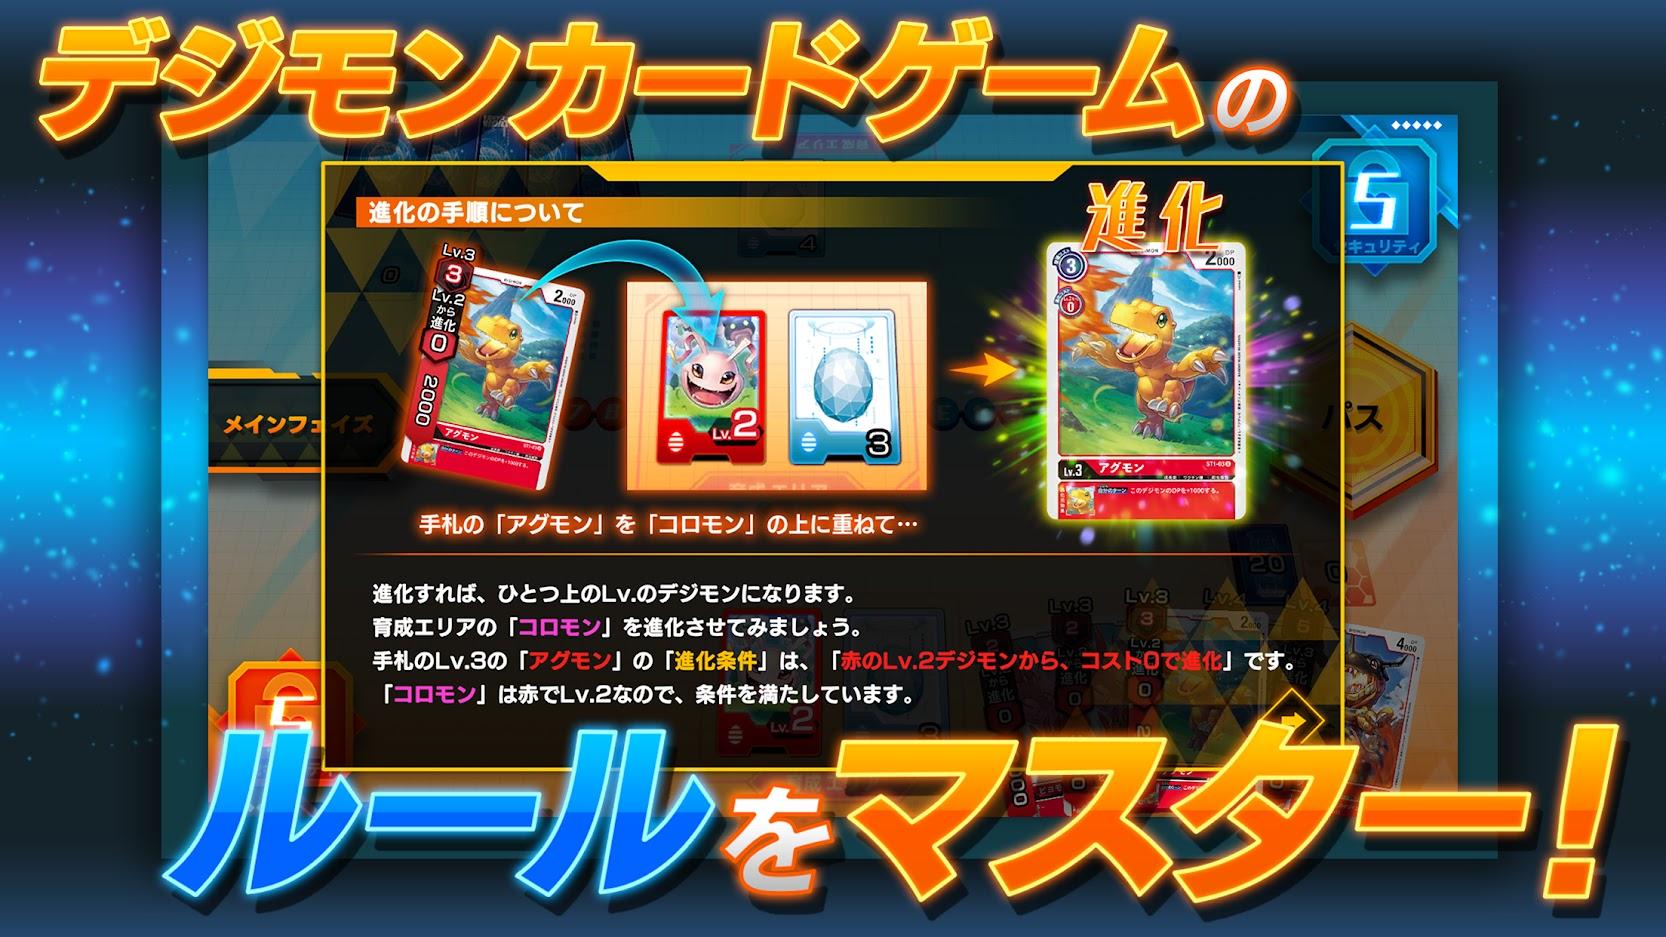 Digimon Card Game 2832020 2